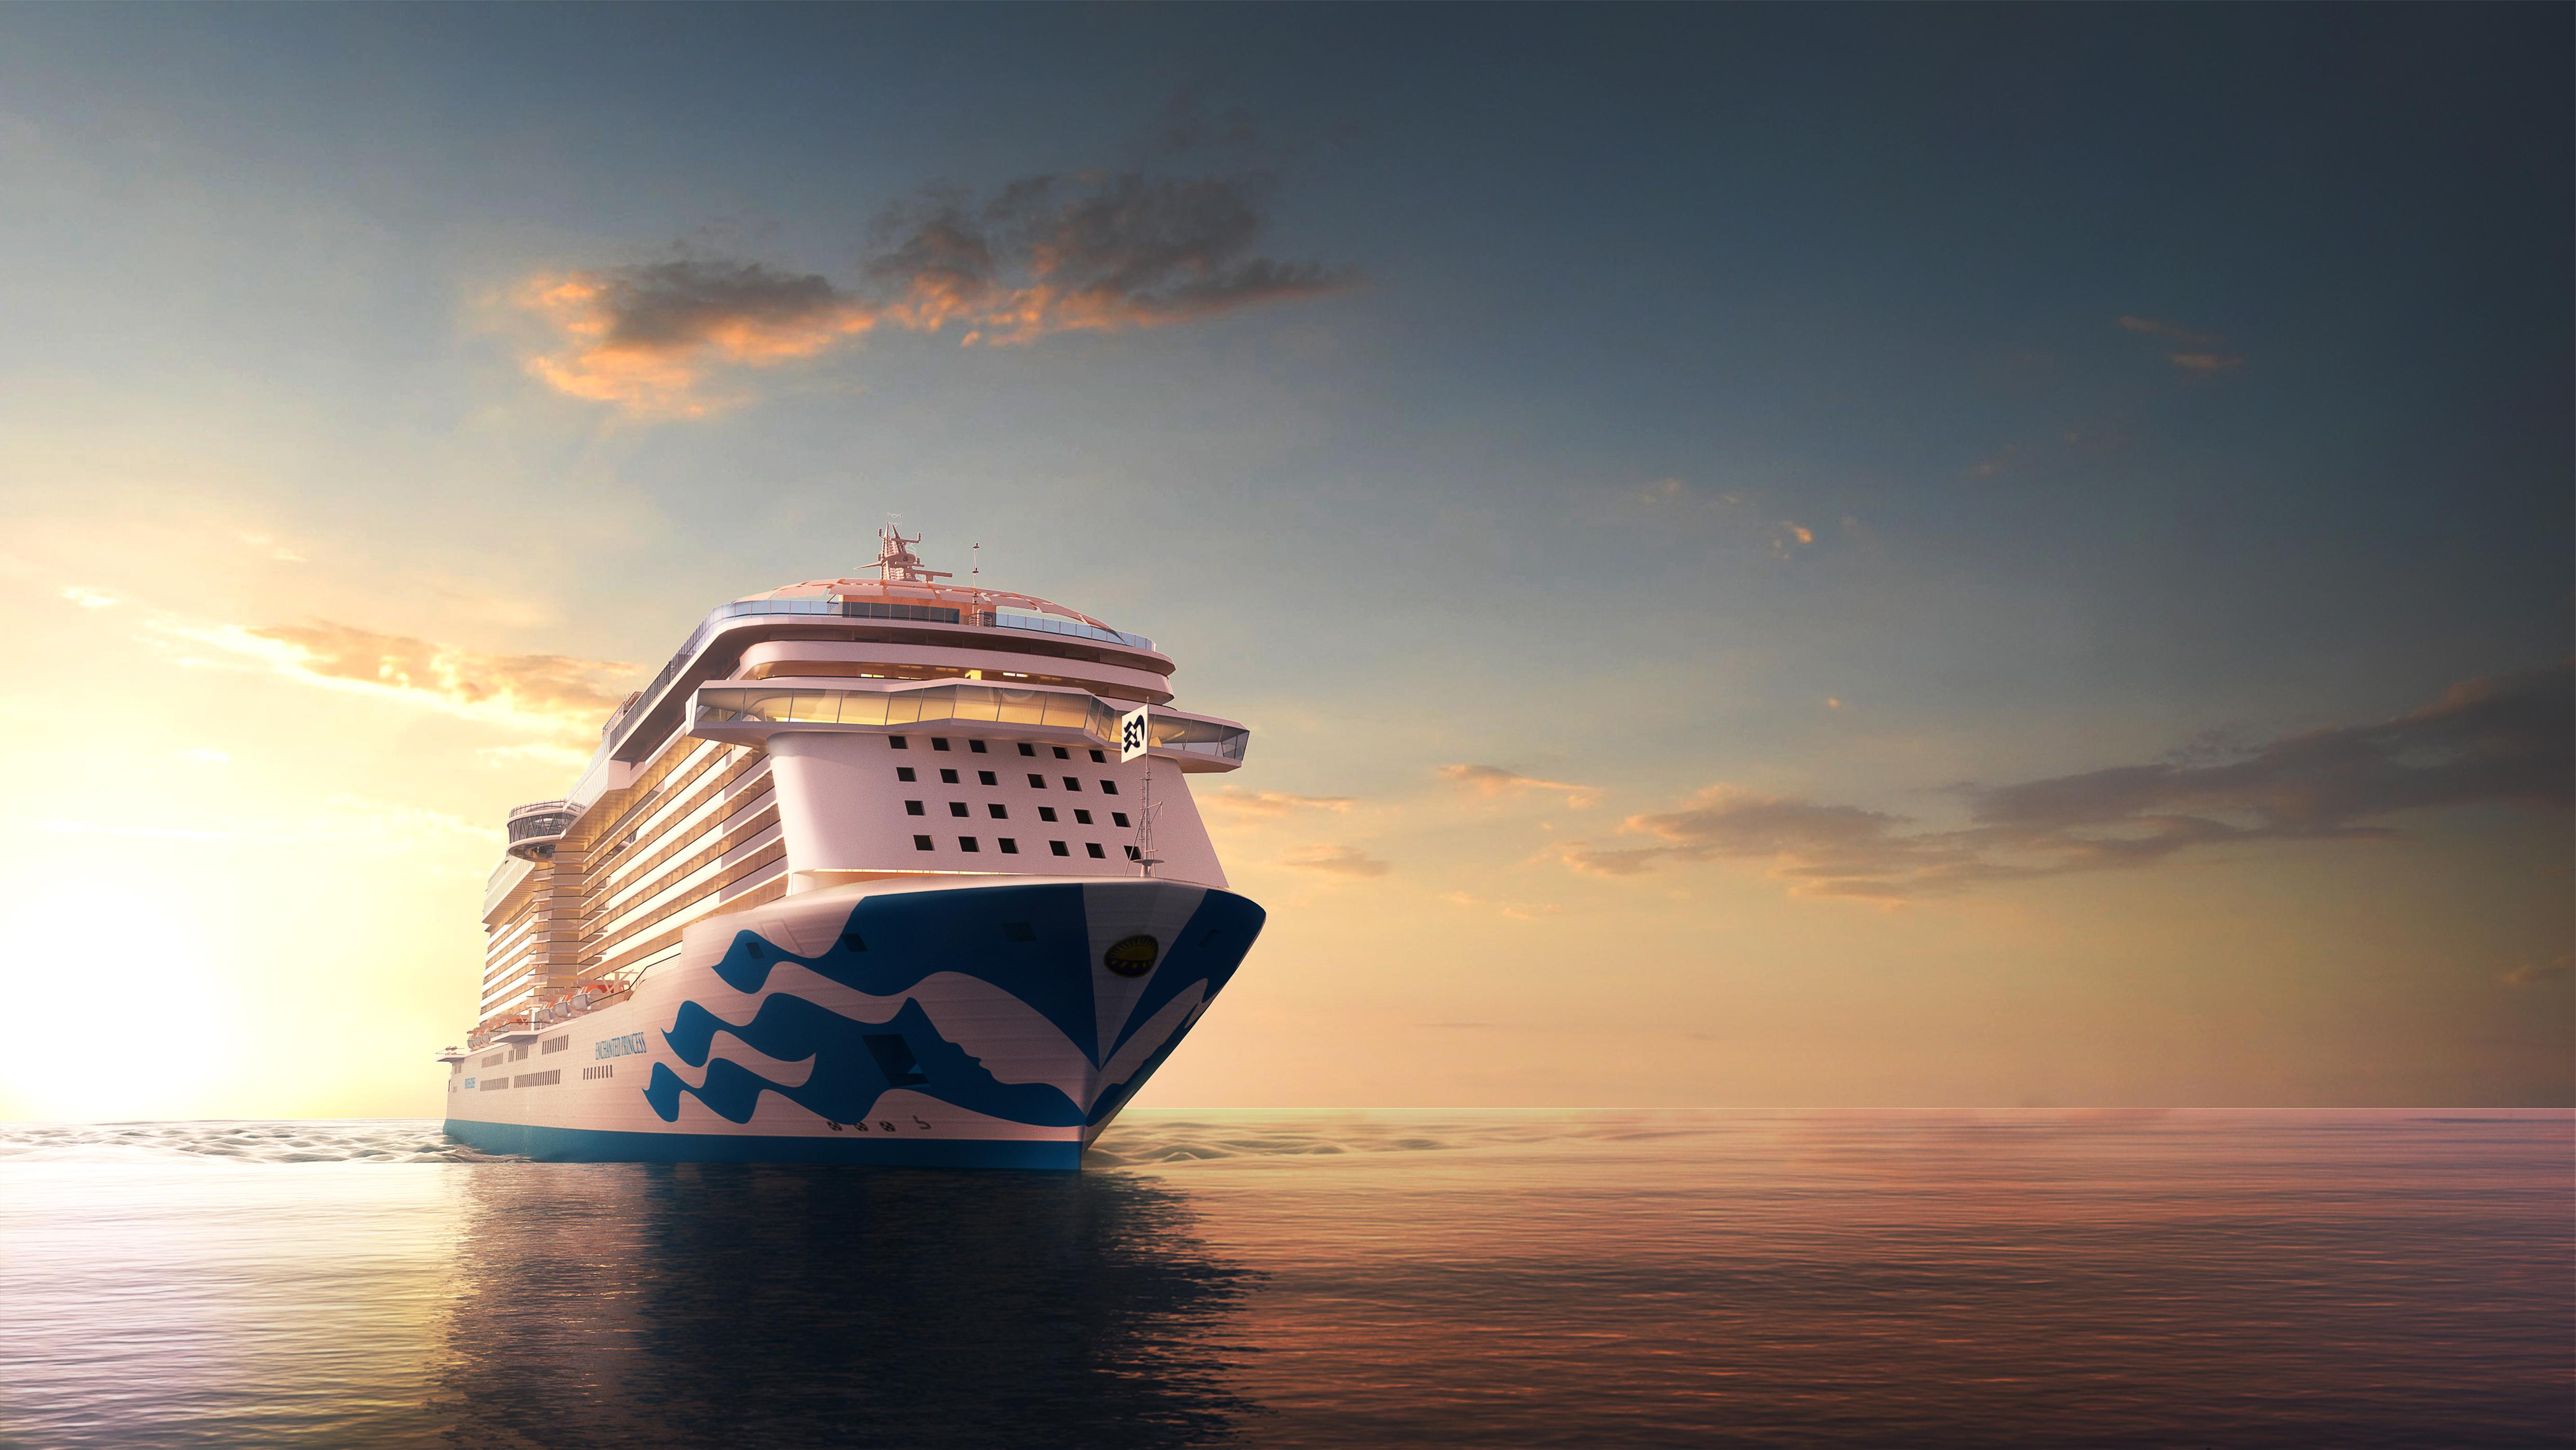 Princess' MedallionClass Ships Make Their Debut